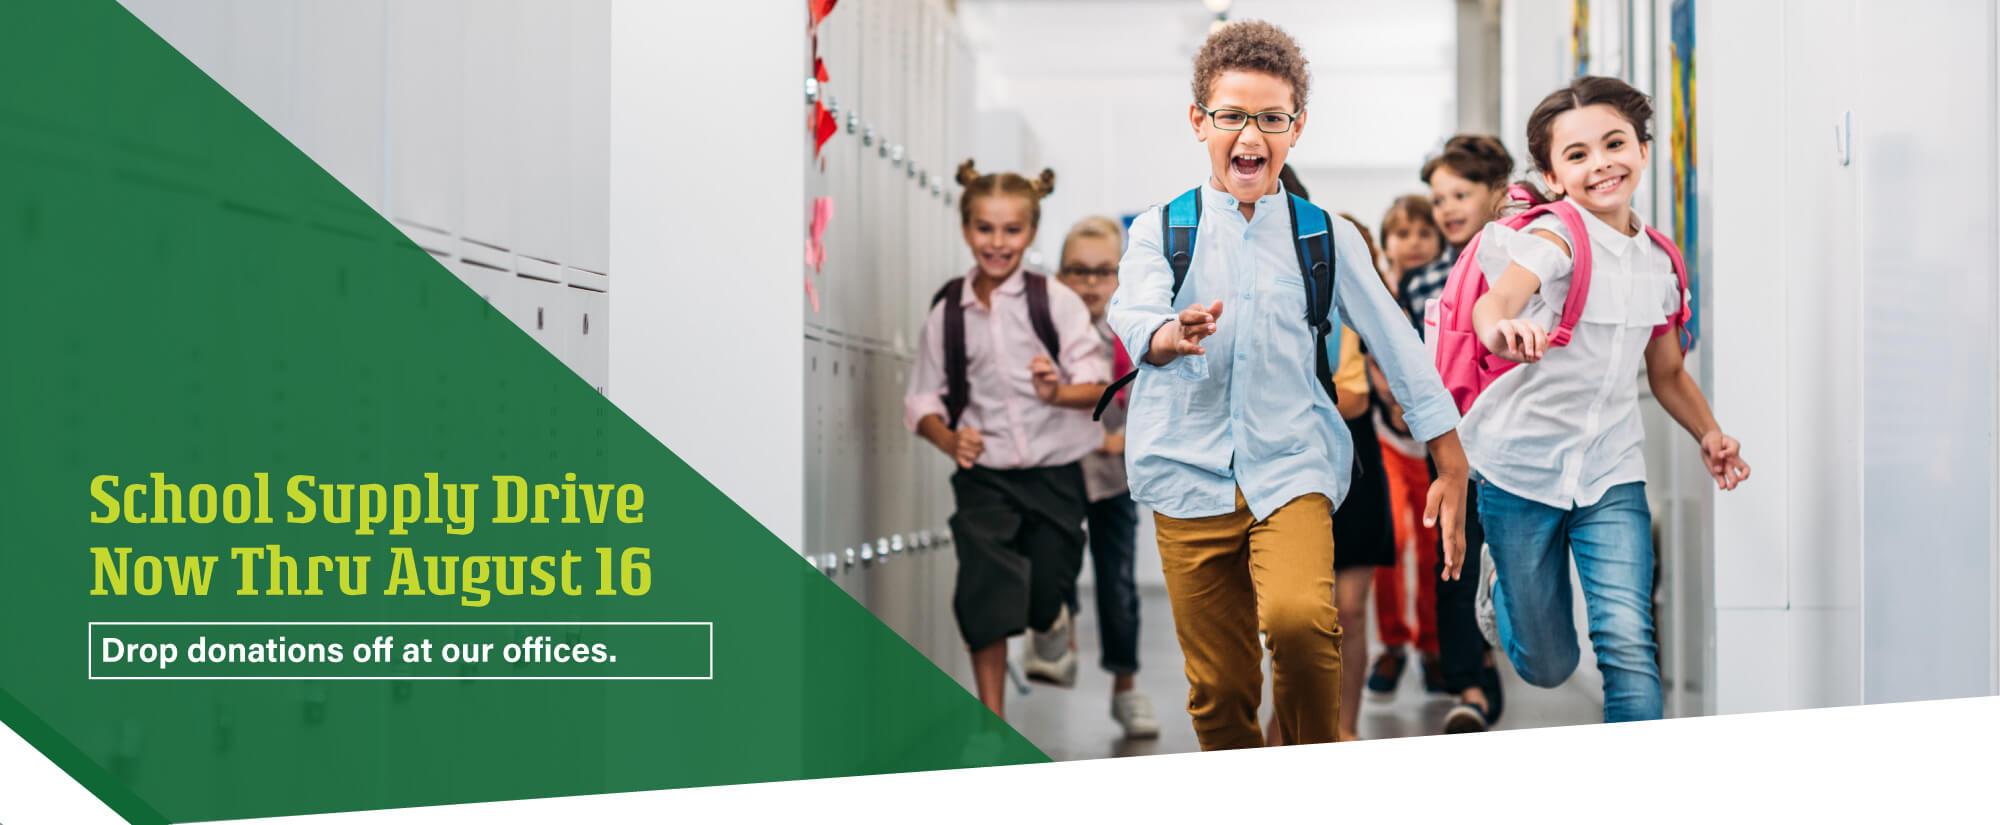 School Supply Drive through August 16th